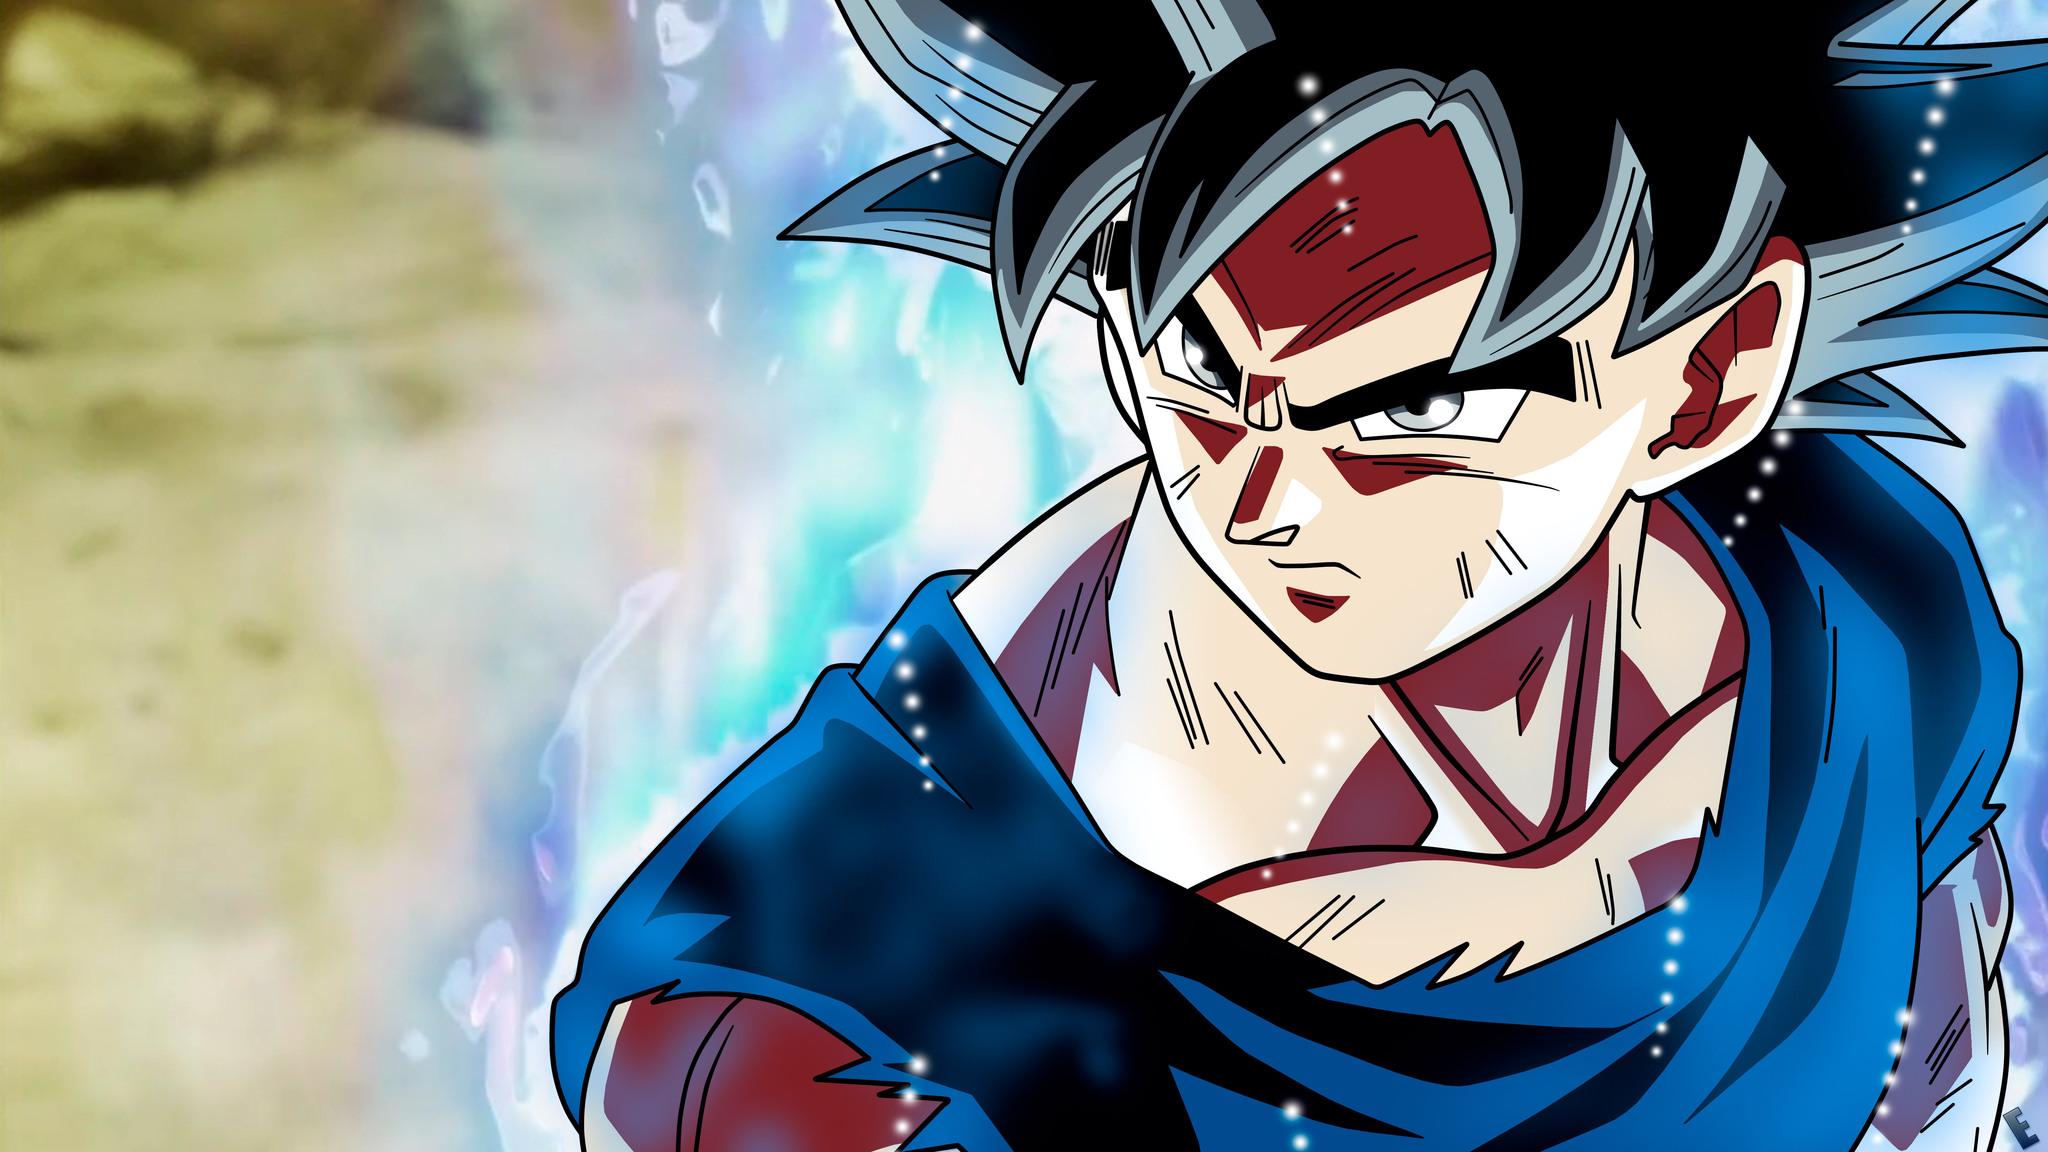 2048x1152 Son Goku Dragon Ball Super Anime Retina Display 5k 2048x1152 Resolution HD 4k ...